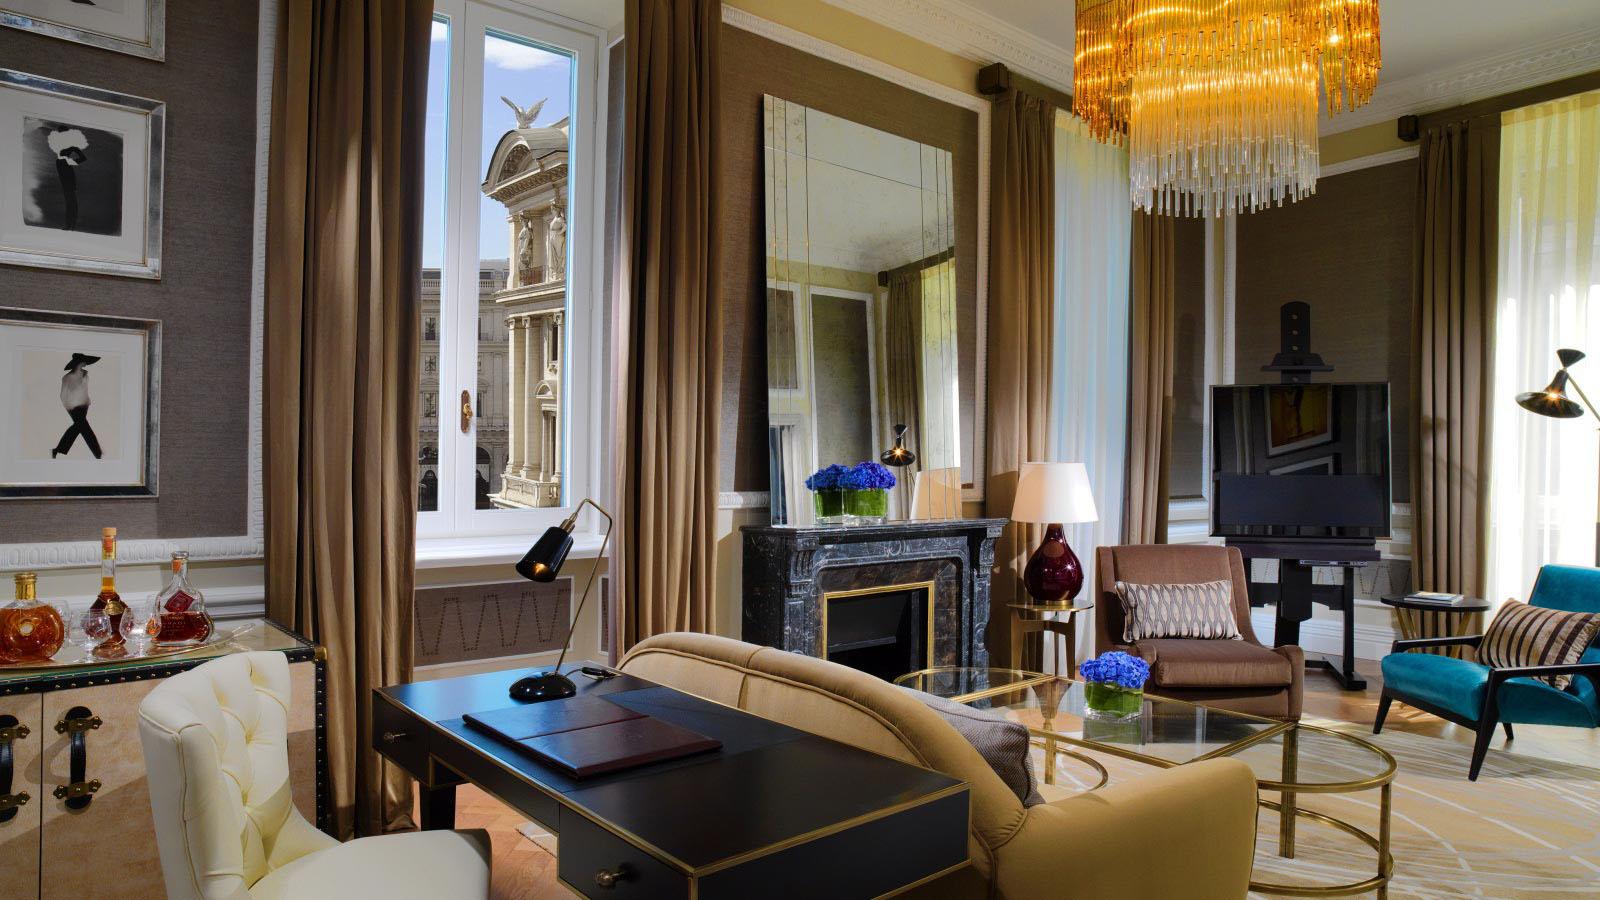 St. Regis Rome Couture Suite